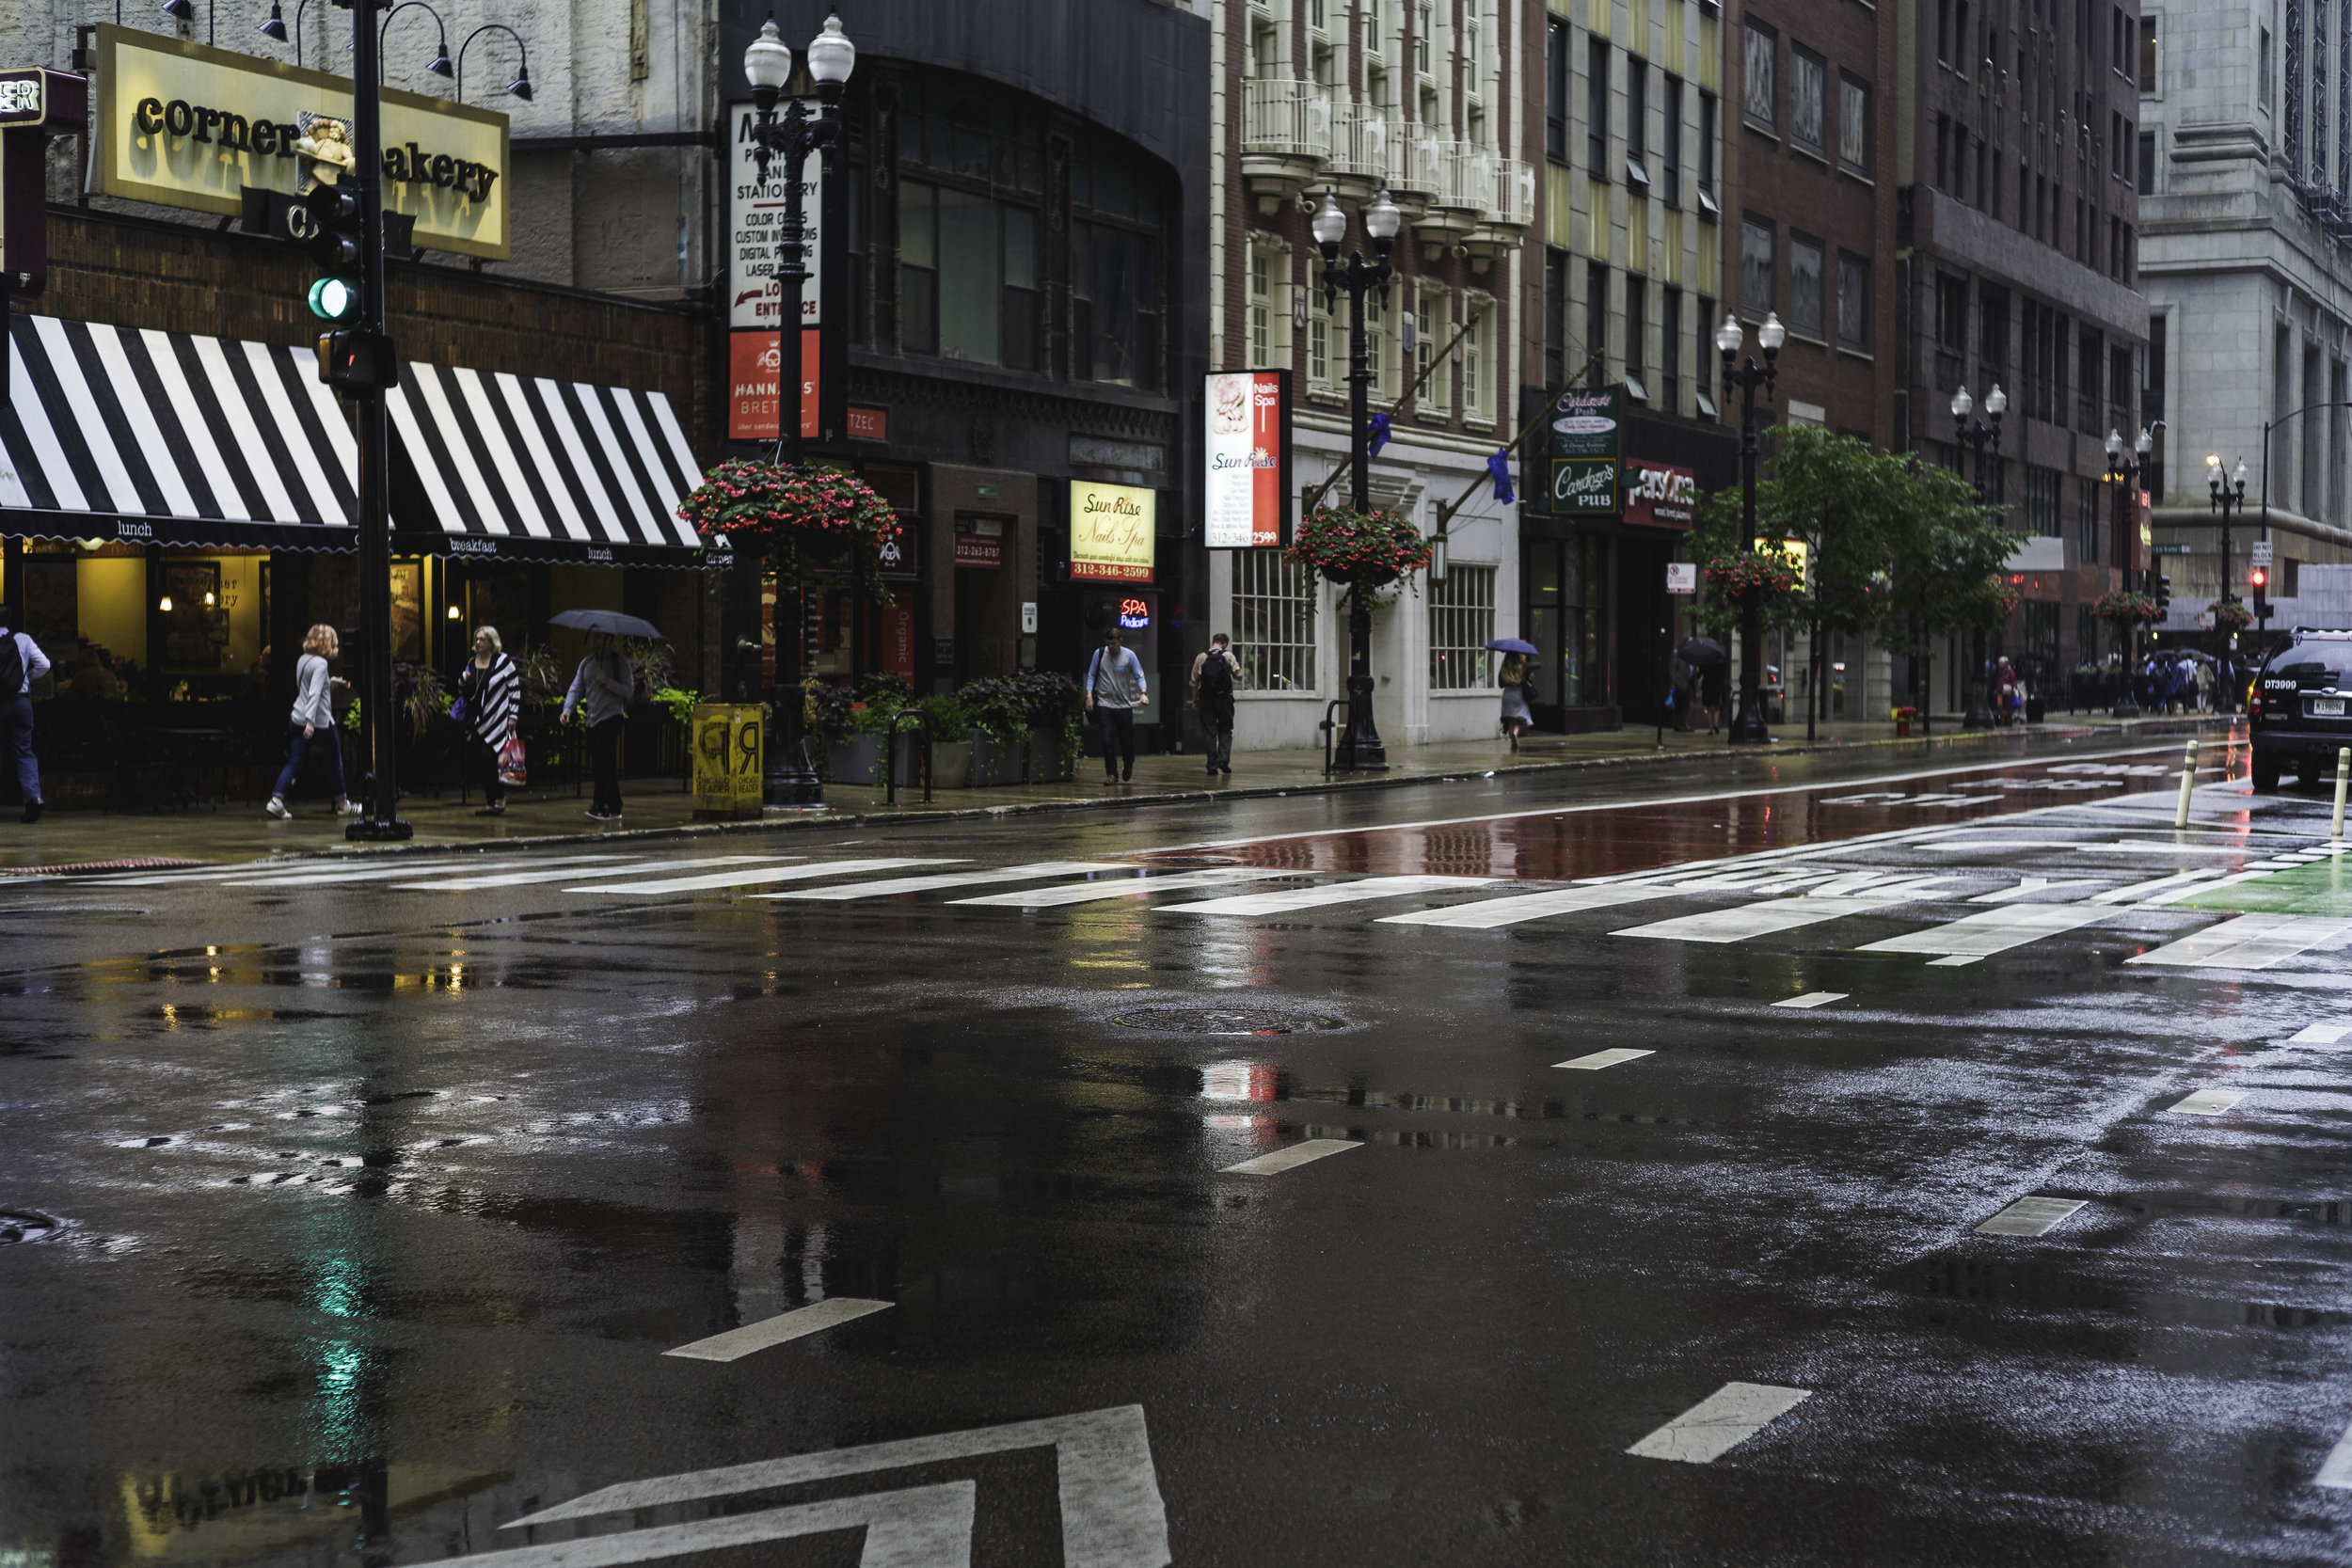 Rainy Chicago St.